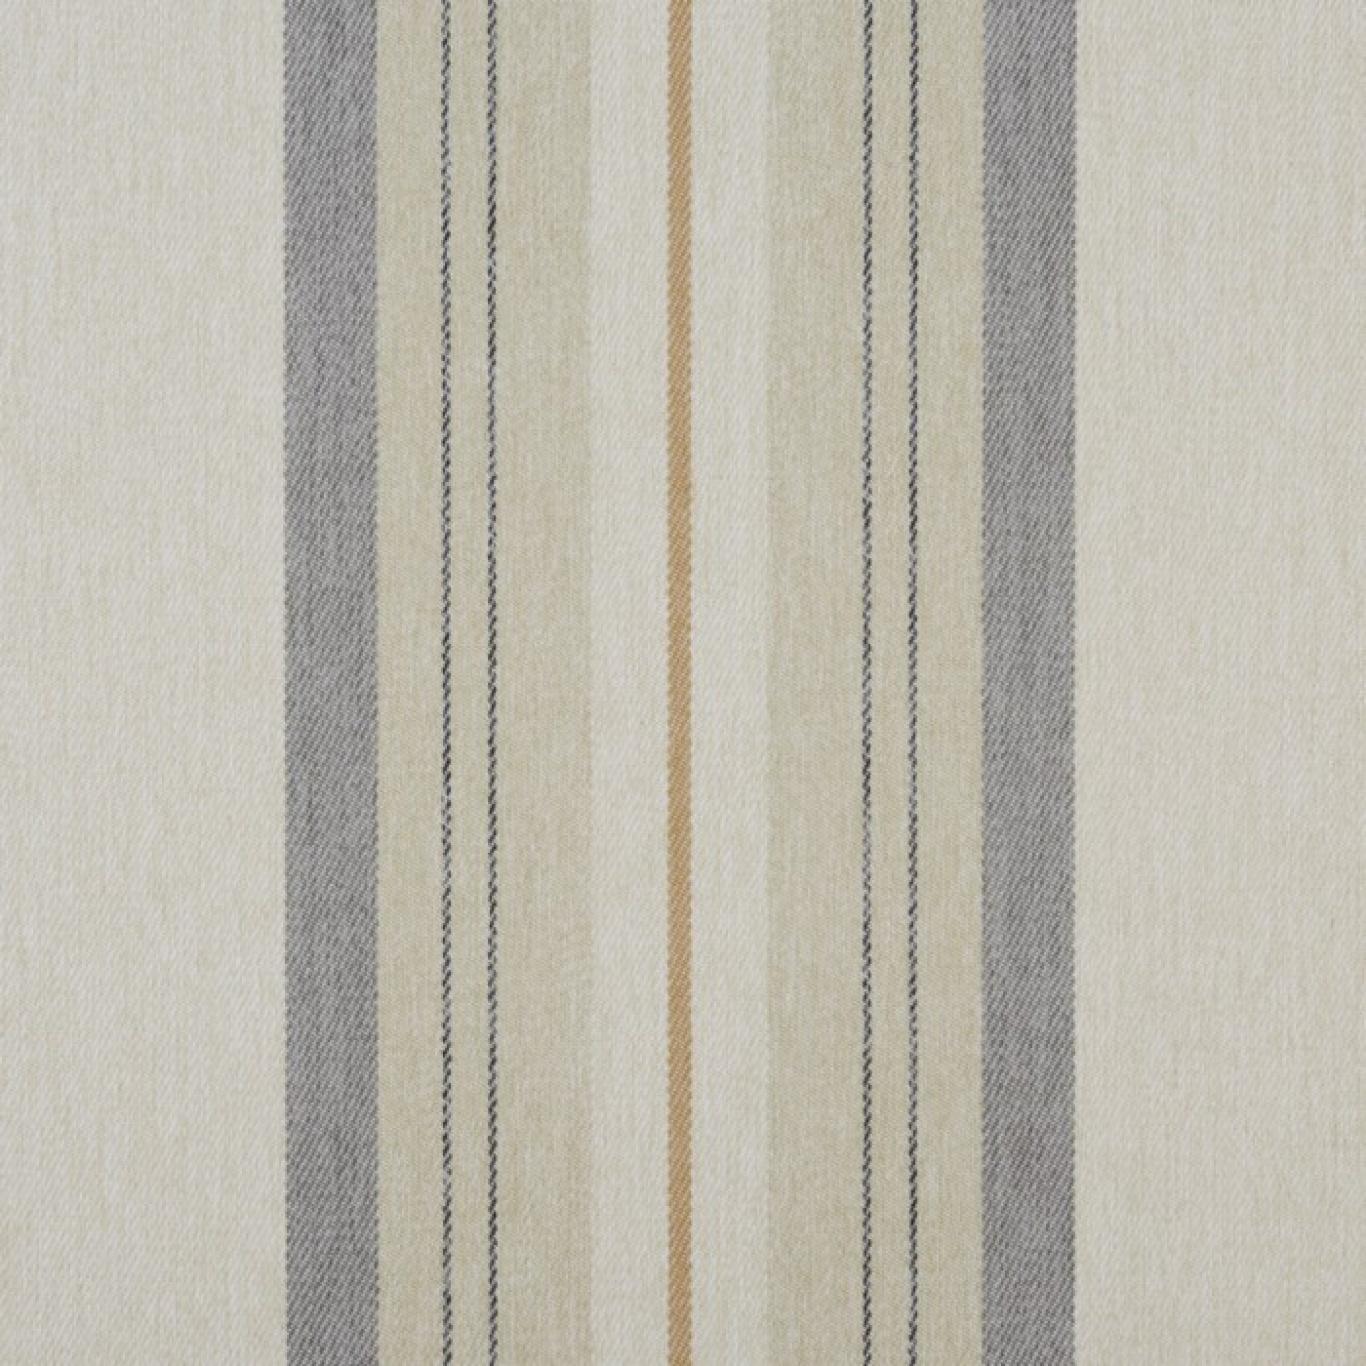 Image of Prestigious Glenfinnan Oatmeal Fabric